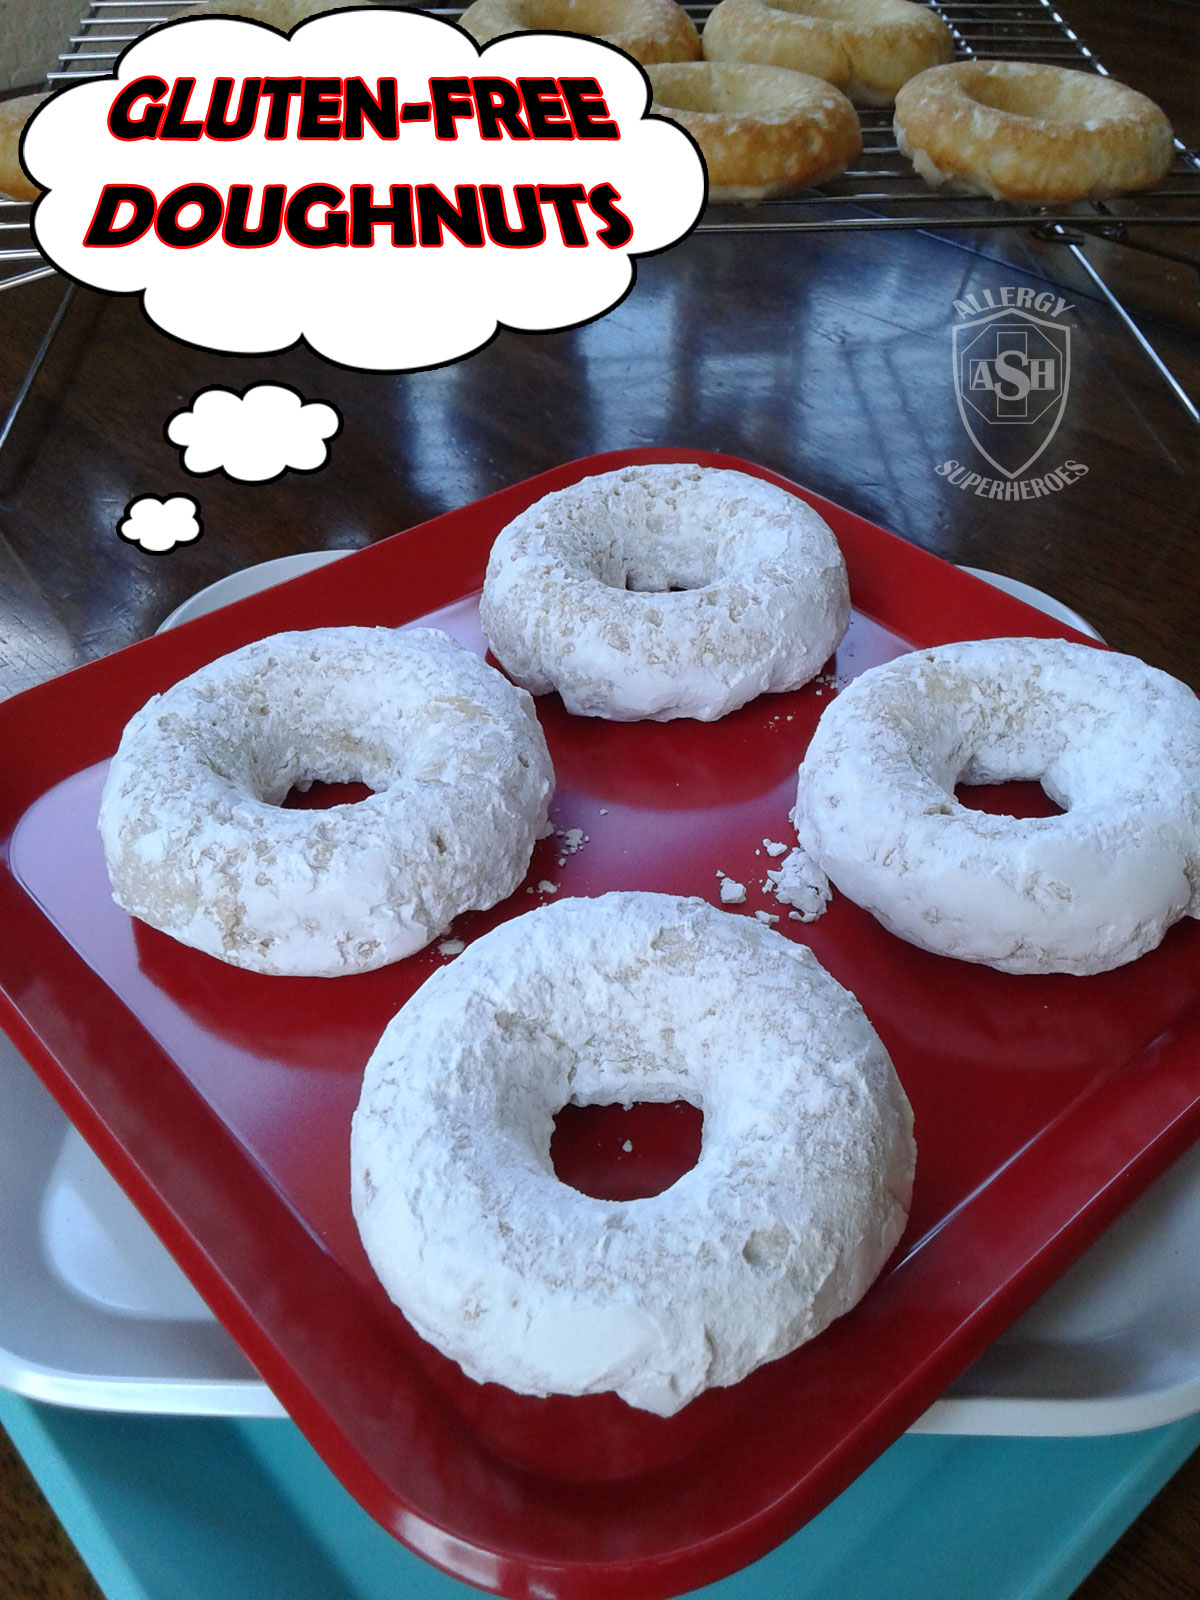 Gluten Free Baked Doughnut Goodies